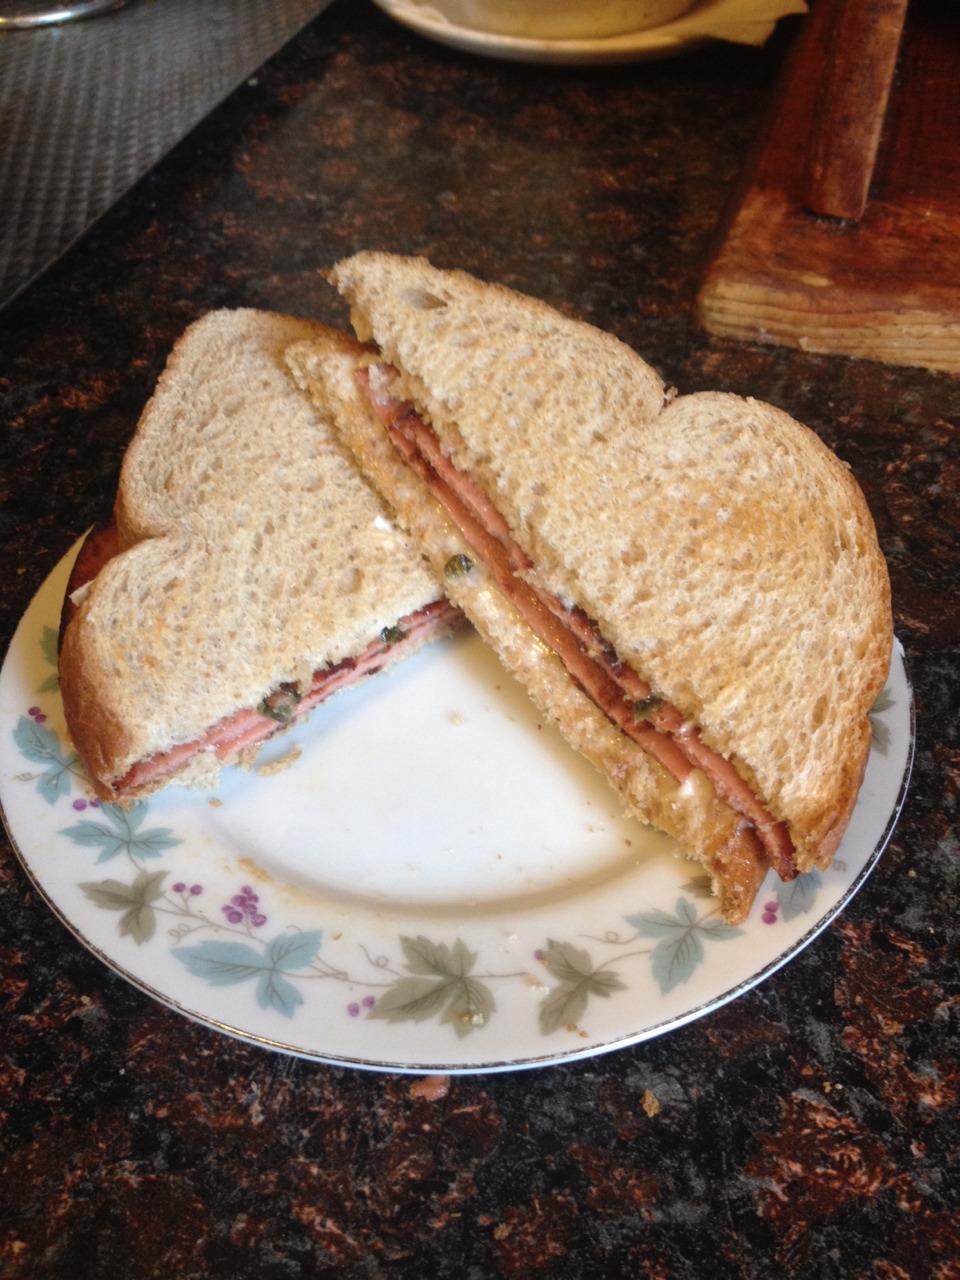 how to make a fried sandwich